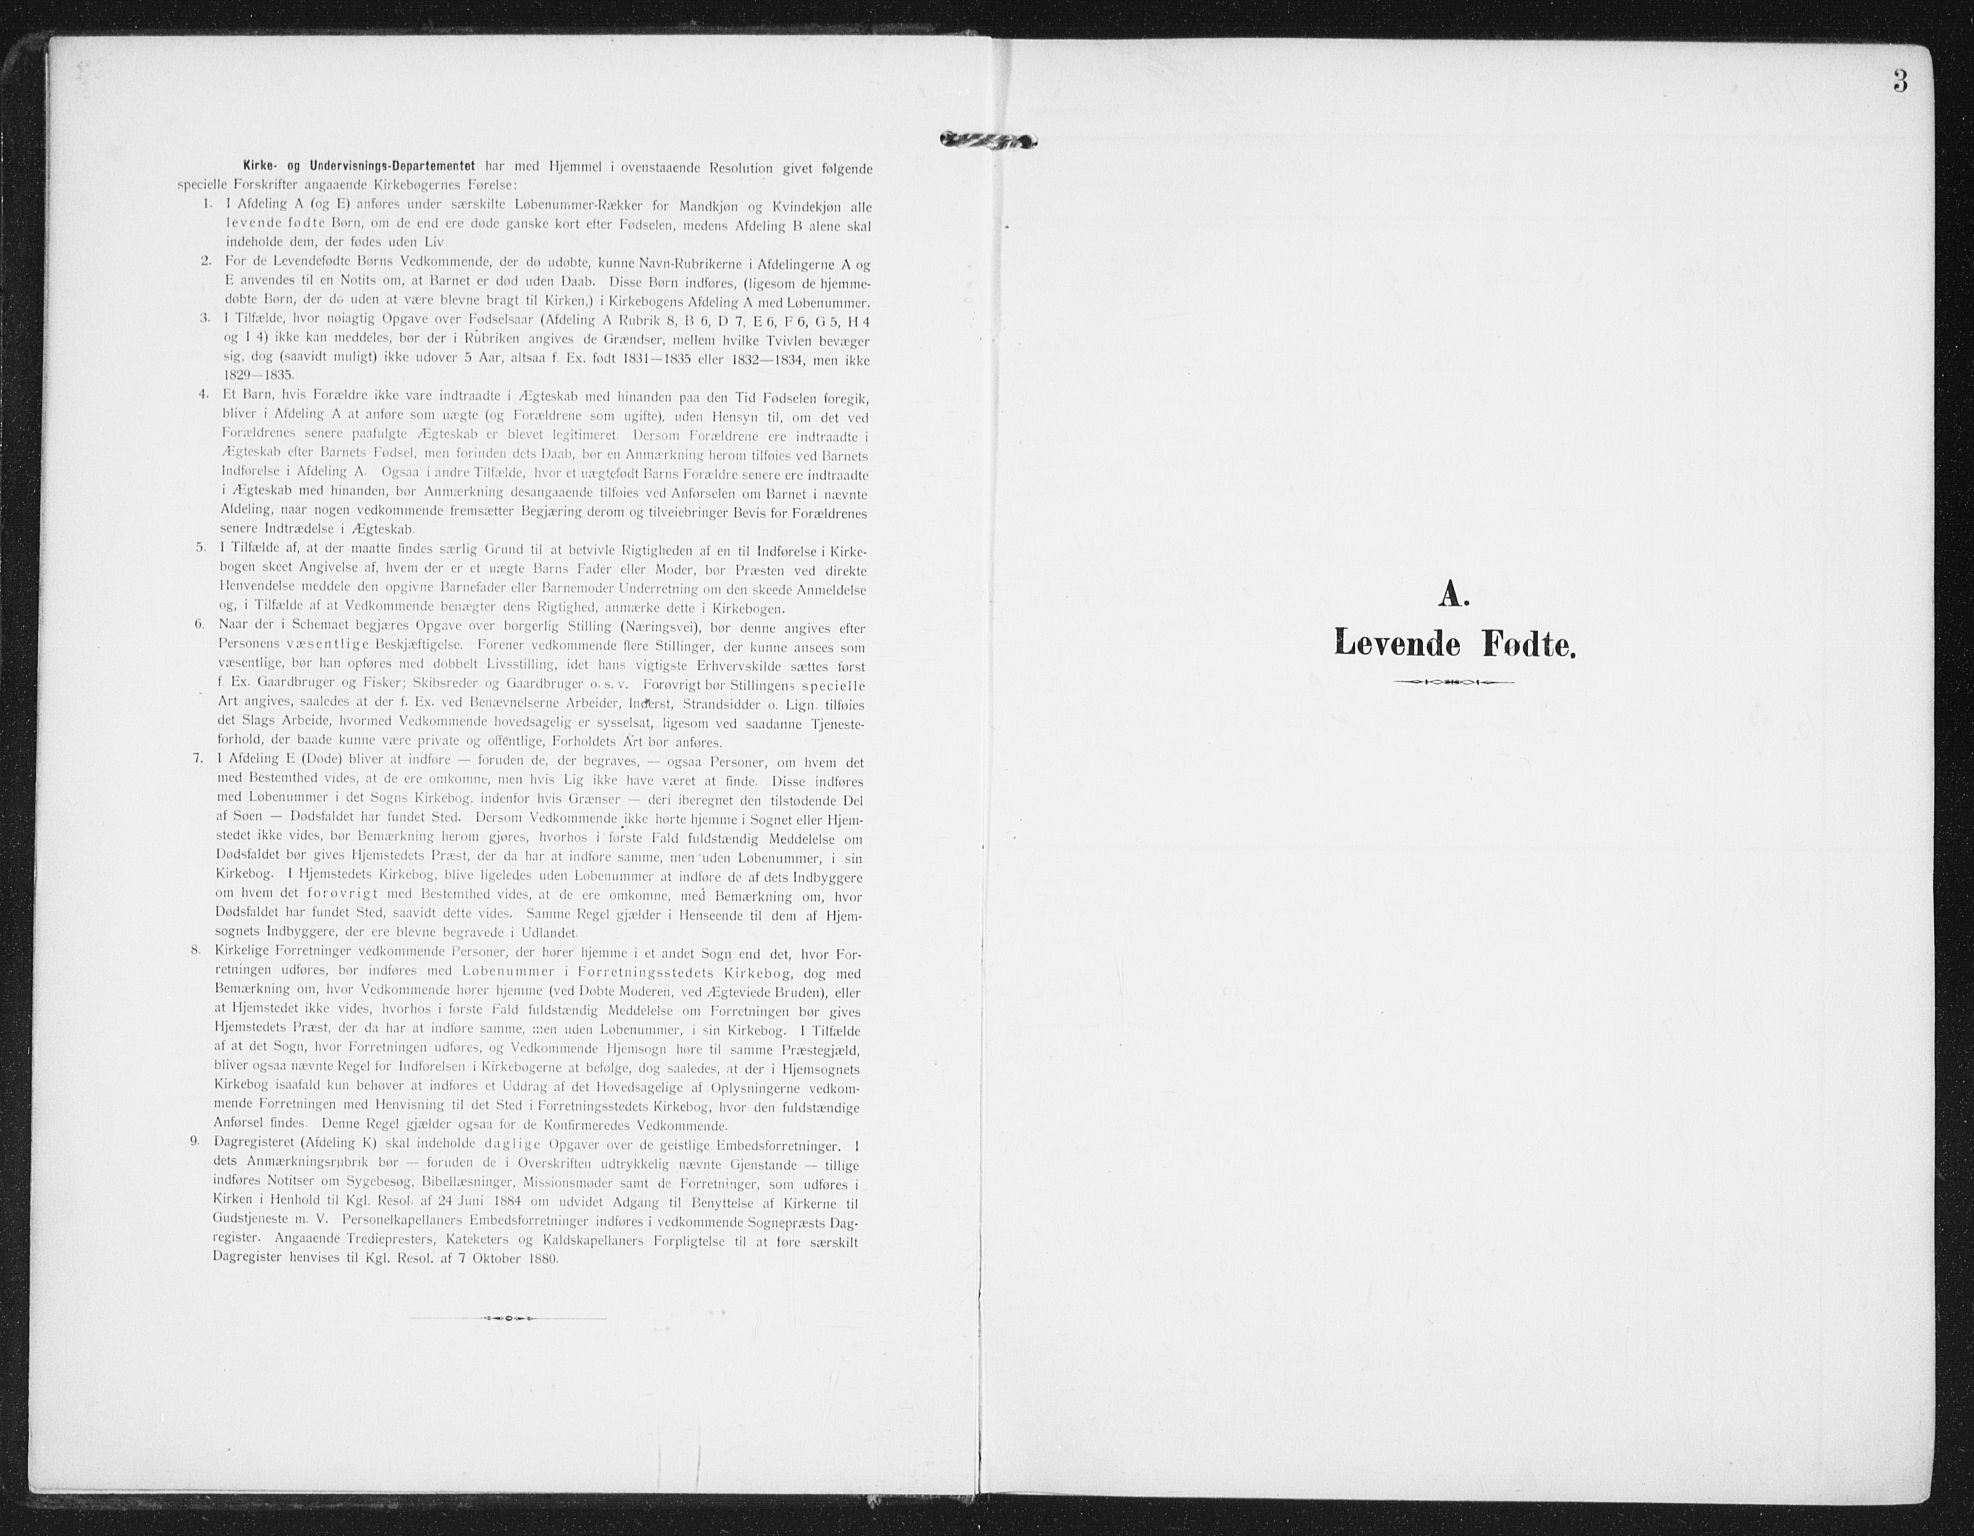 SAT, Ministerialprotokoller, klokkerbøker og fødselsregistre - Nordland, 885/L1206: Ministerialbok nr. 885A07, 1905-1915, s. 3